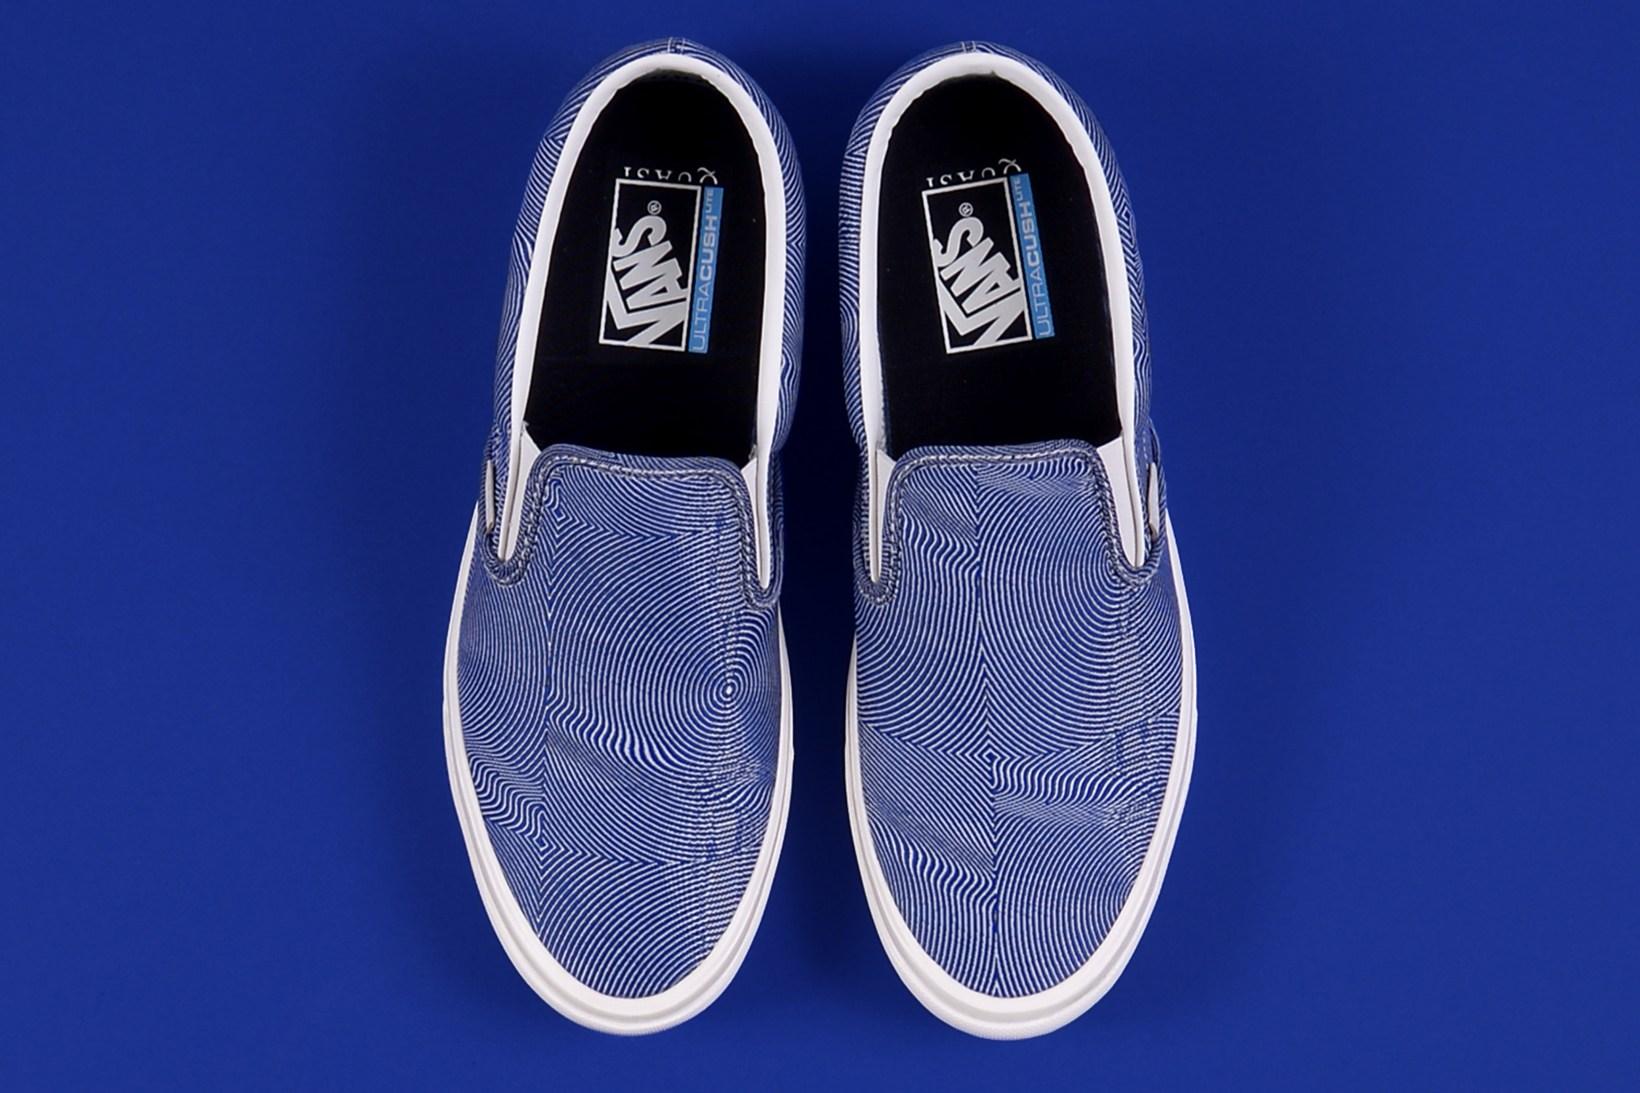 vans-pro-skate-arcad-gilbert-crockett-quasi-skateboards-3